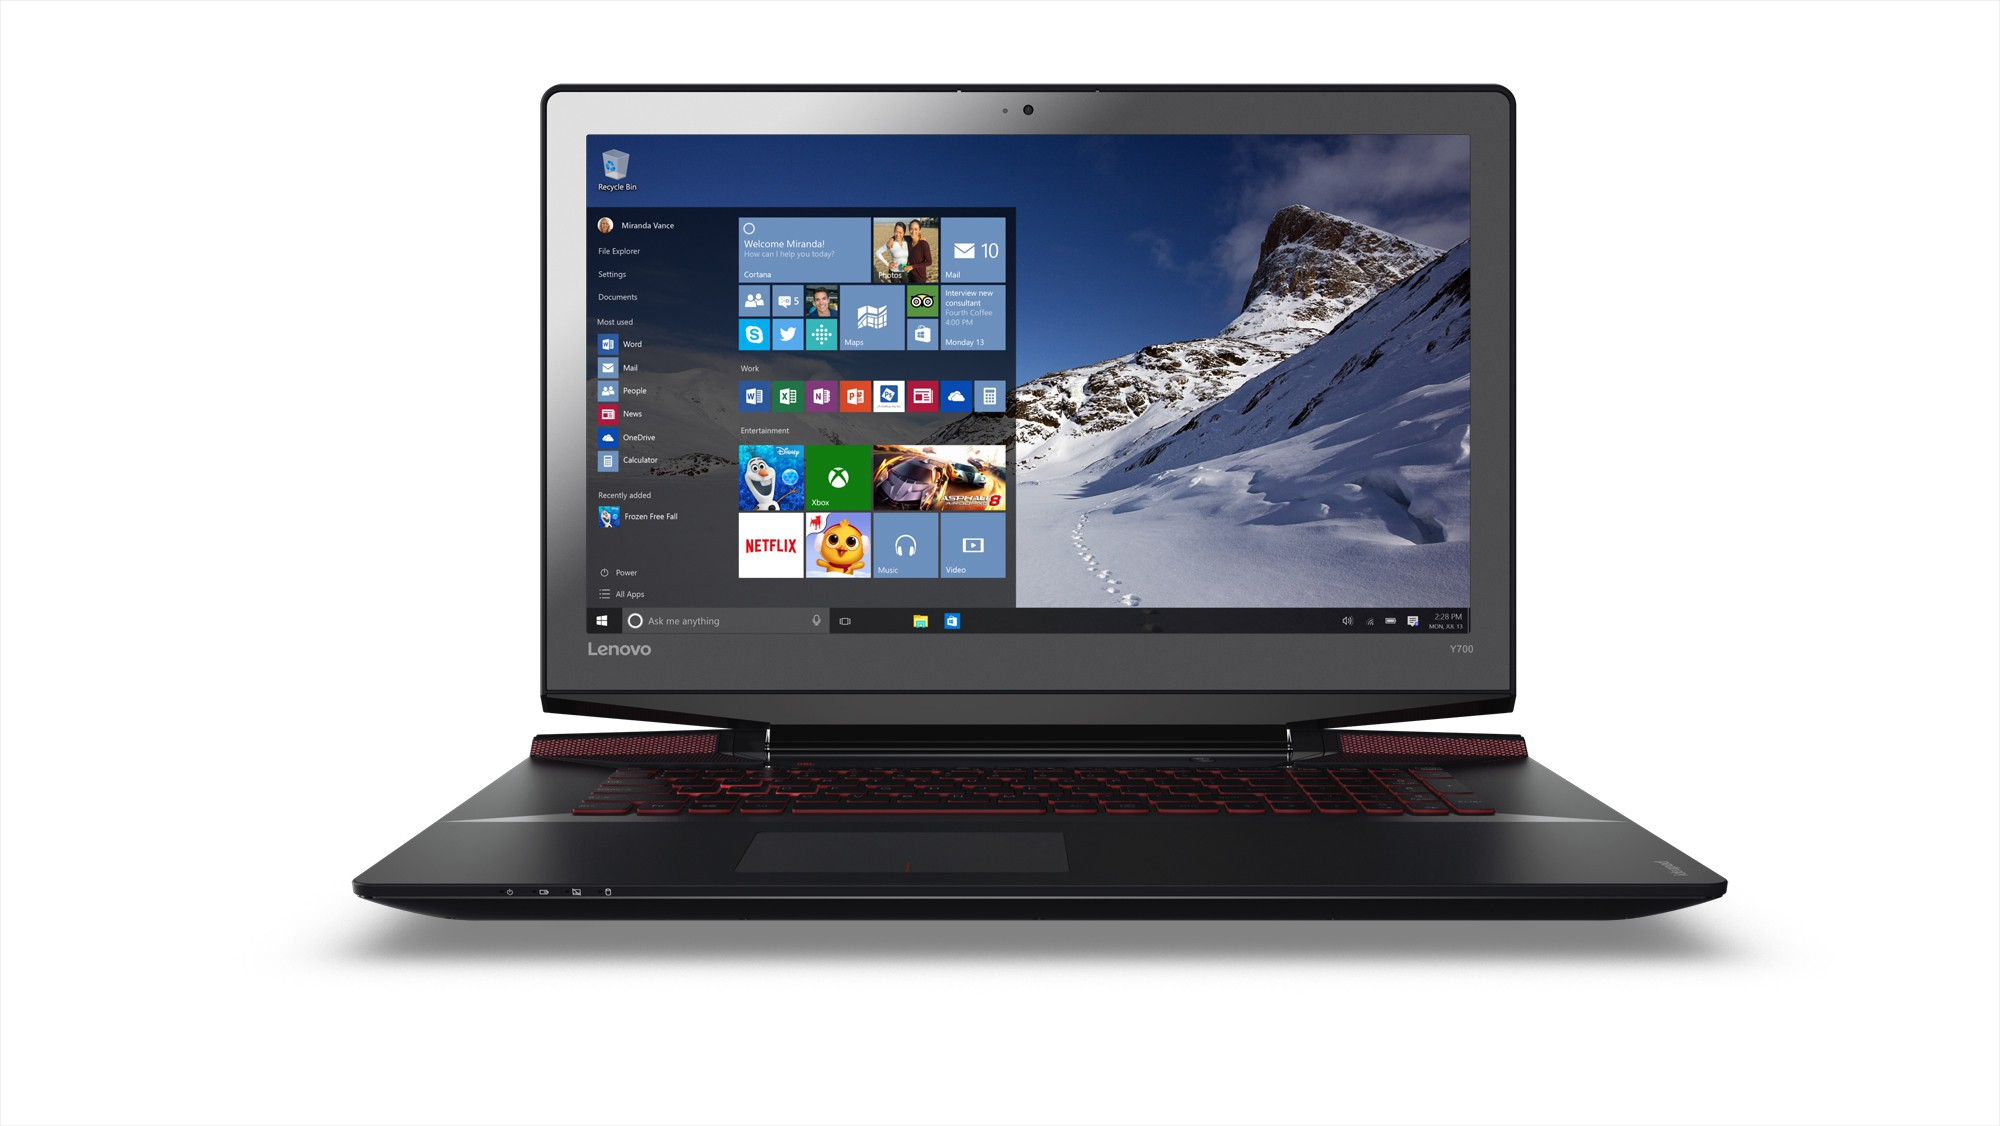 Lenovo Core i5 7th Gen - (4 GB/1 TB HDD/Windows 10 Home/2 GB Graphics) Yoga 510 Laptop(14 inch, Black, 1.7 kg) image